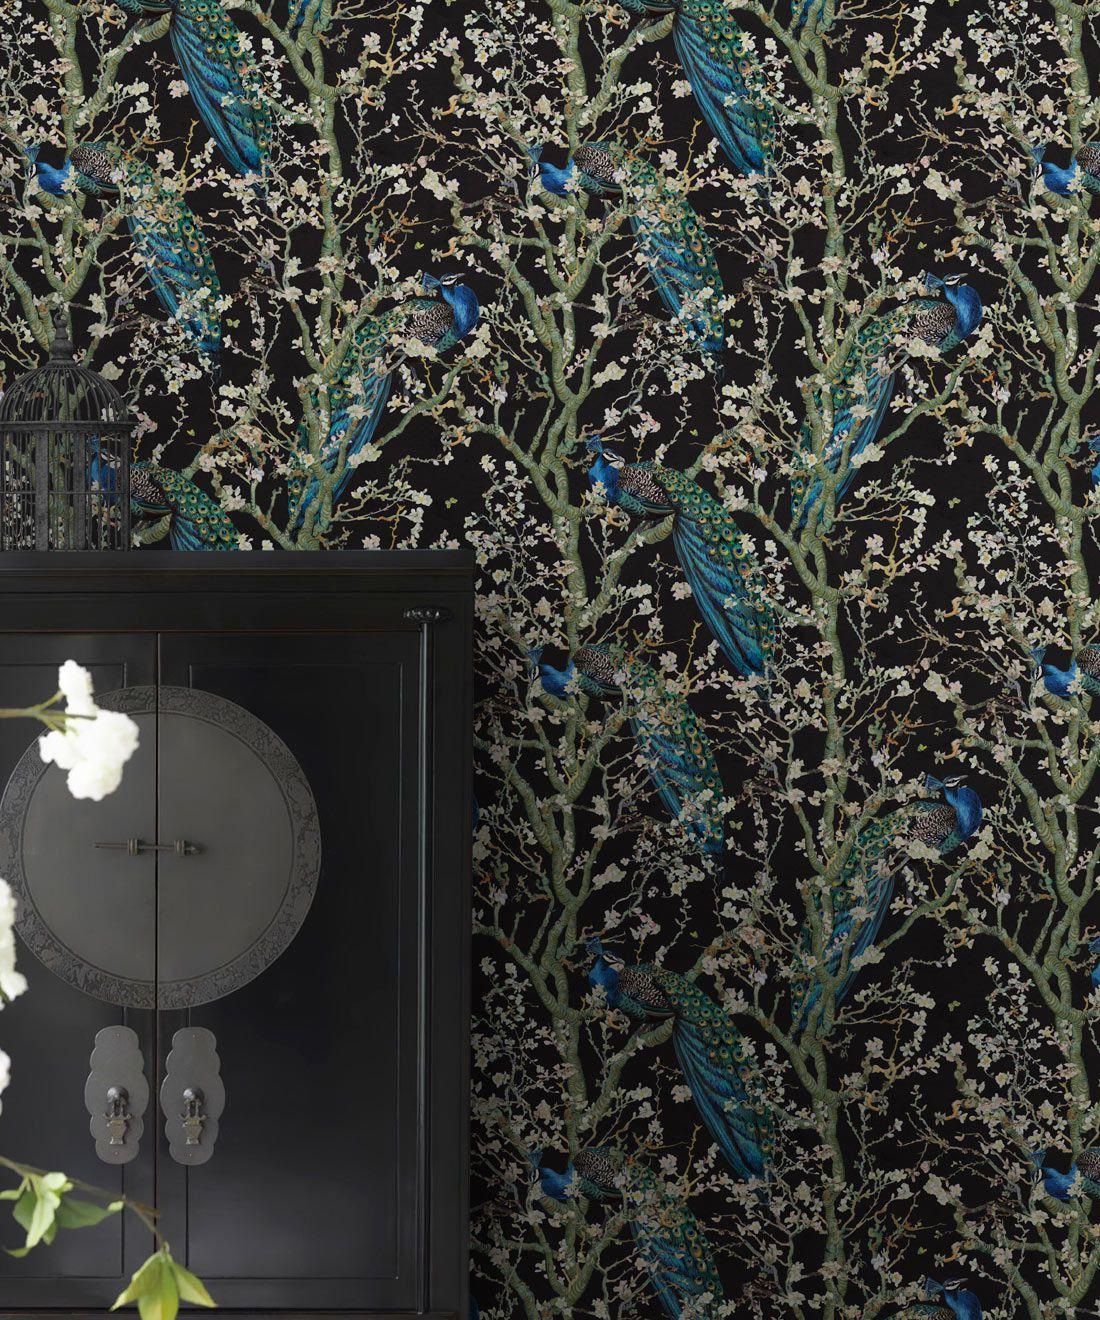 Almond Blossom Wallpaper • Chinoiserie Wallpaper • Wallpaper with Peacocks • Black Night Wallpaper •Insitu